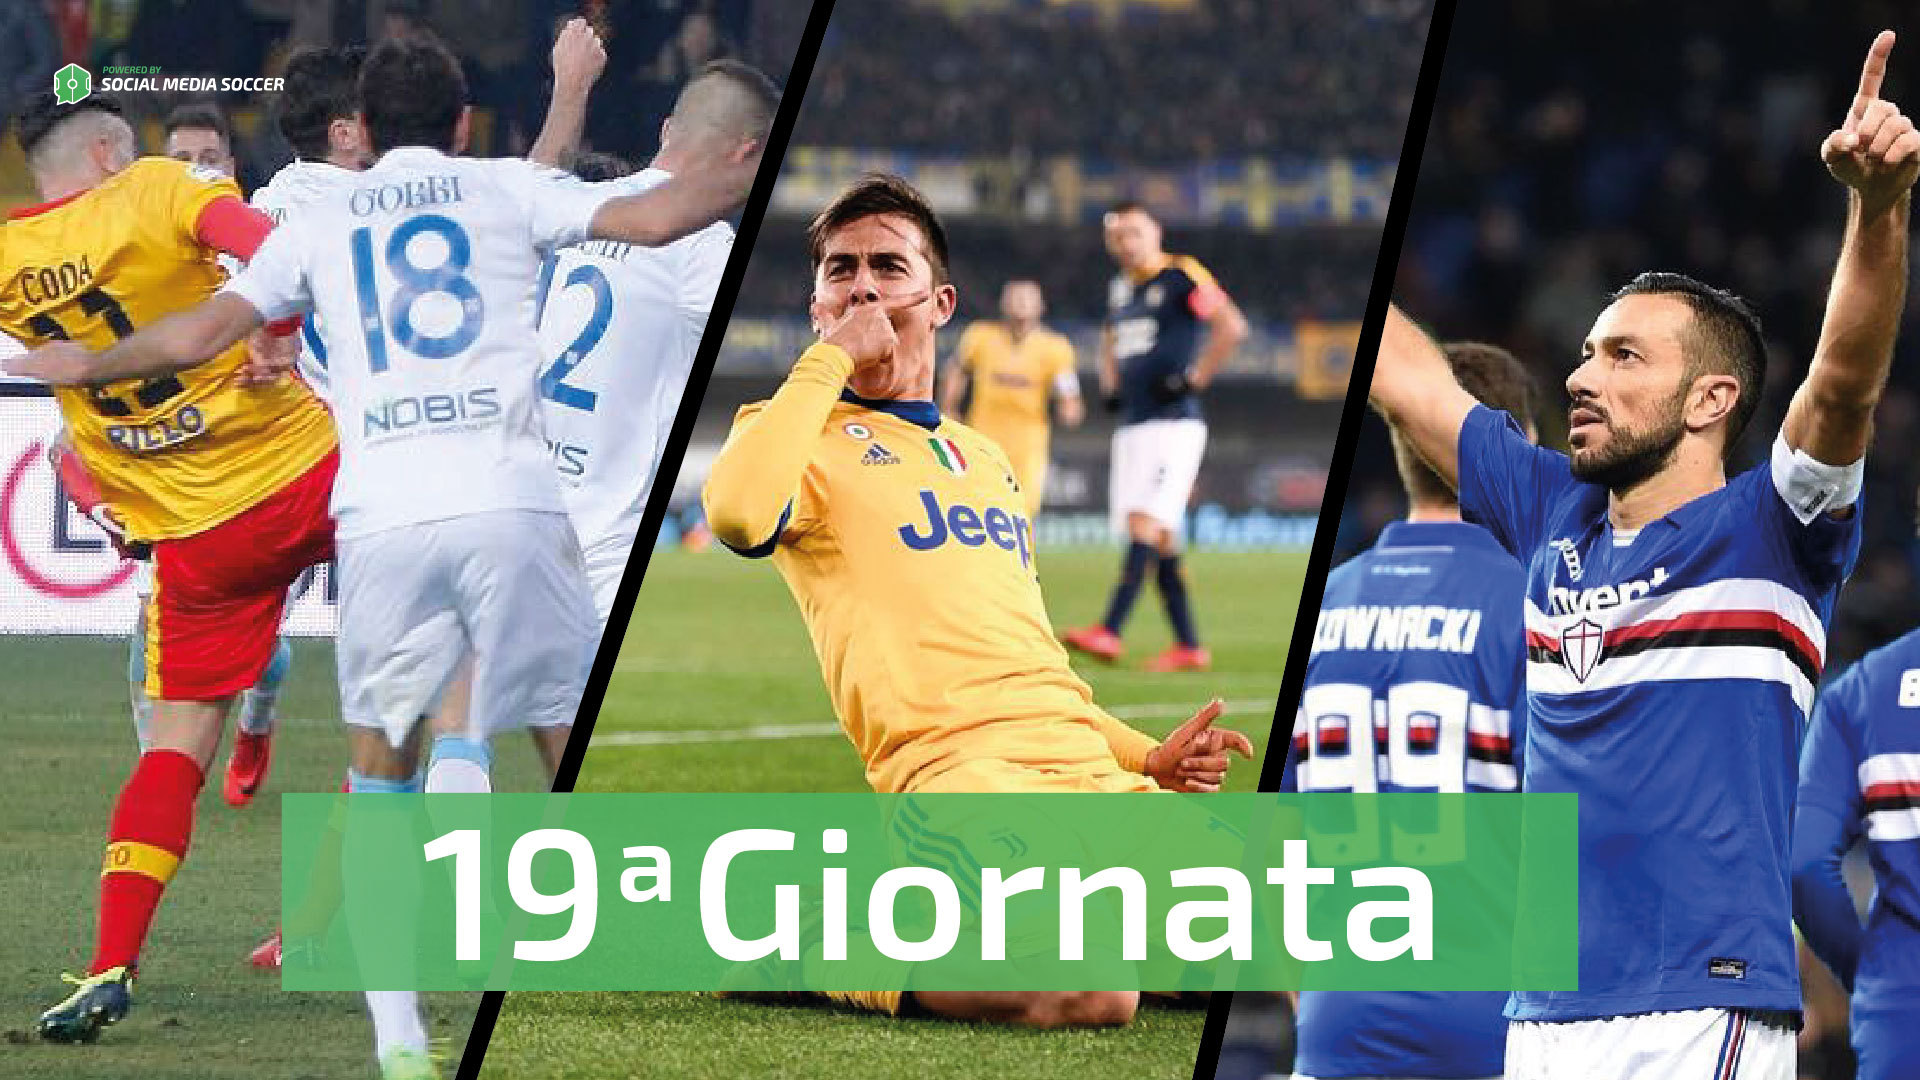 diciannovesima giornata Serie A Social